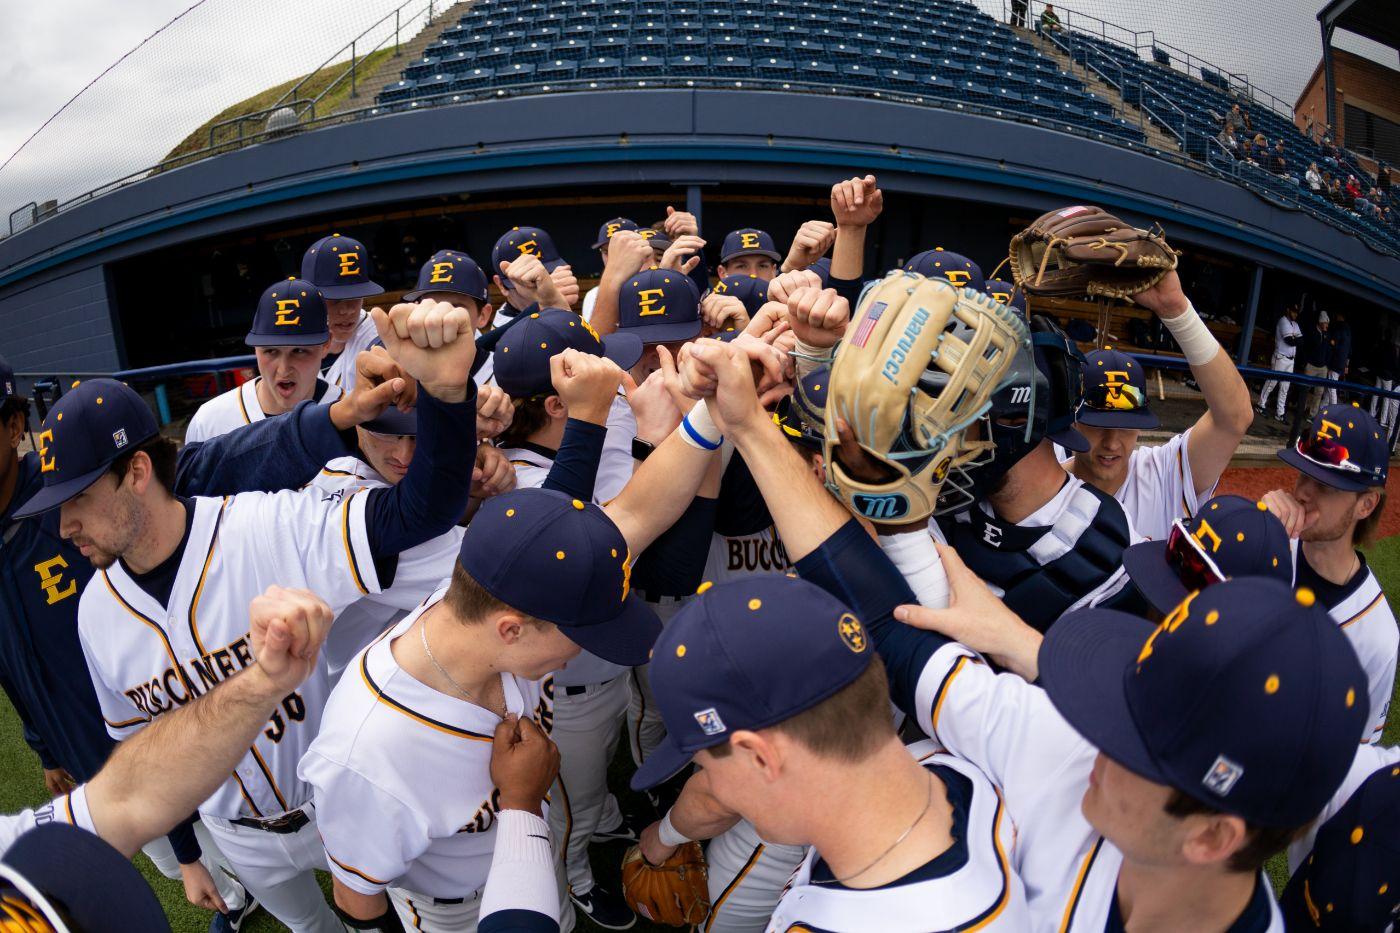 Bucs play Virginia Tech Tuesday at 2 p.m.